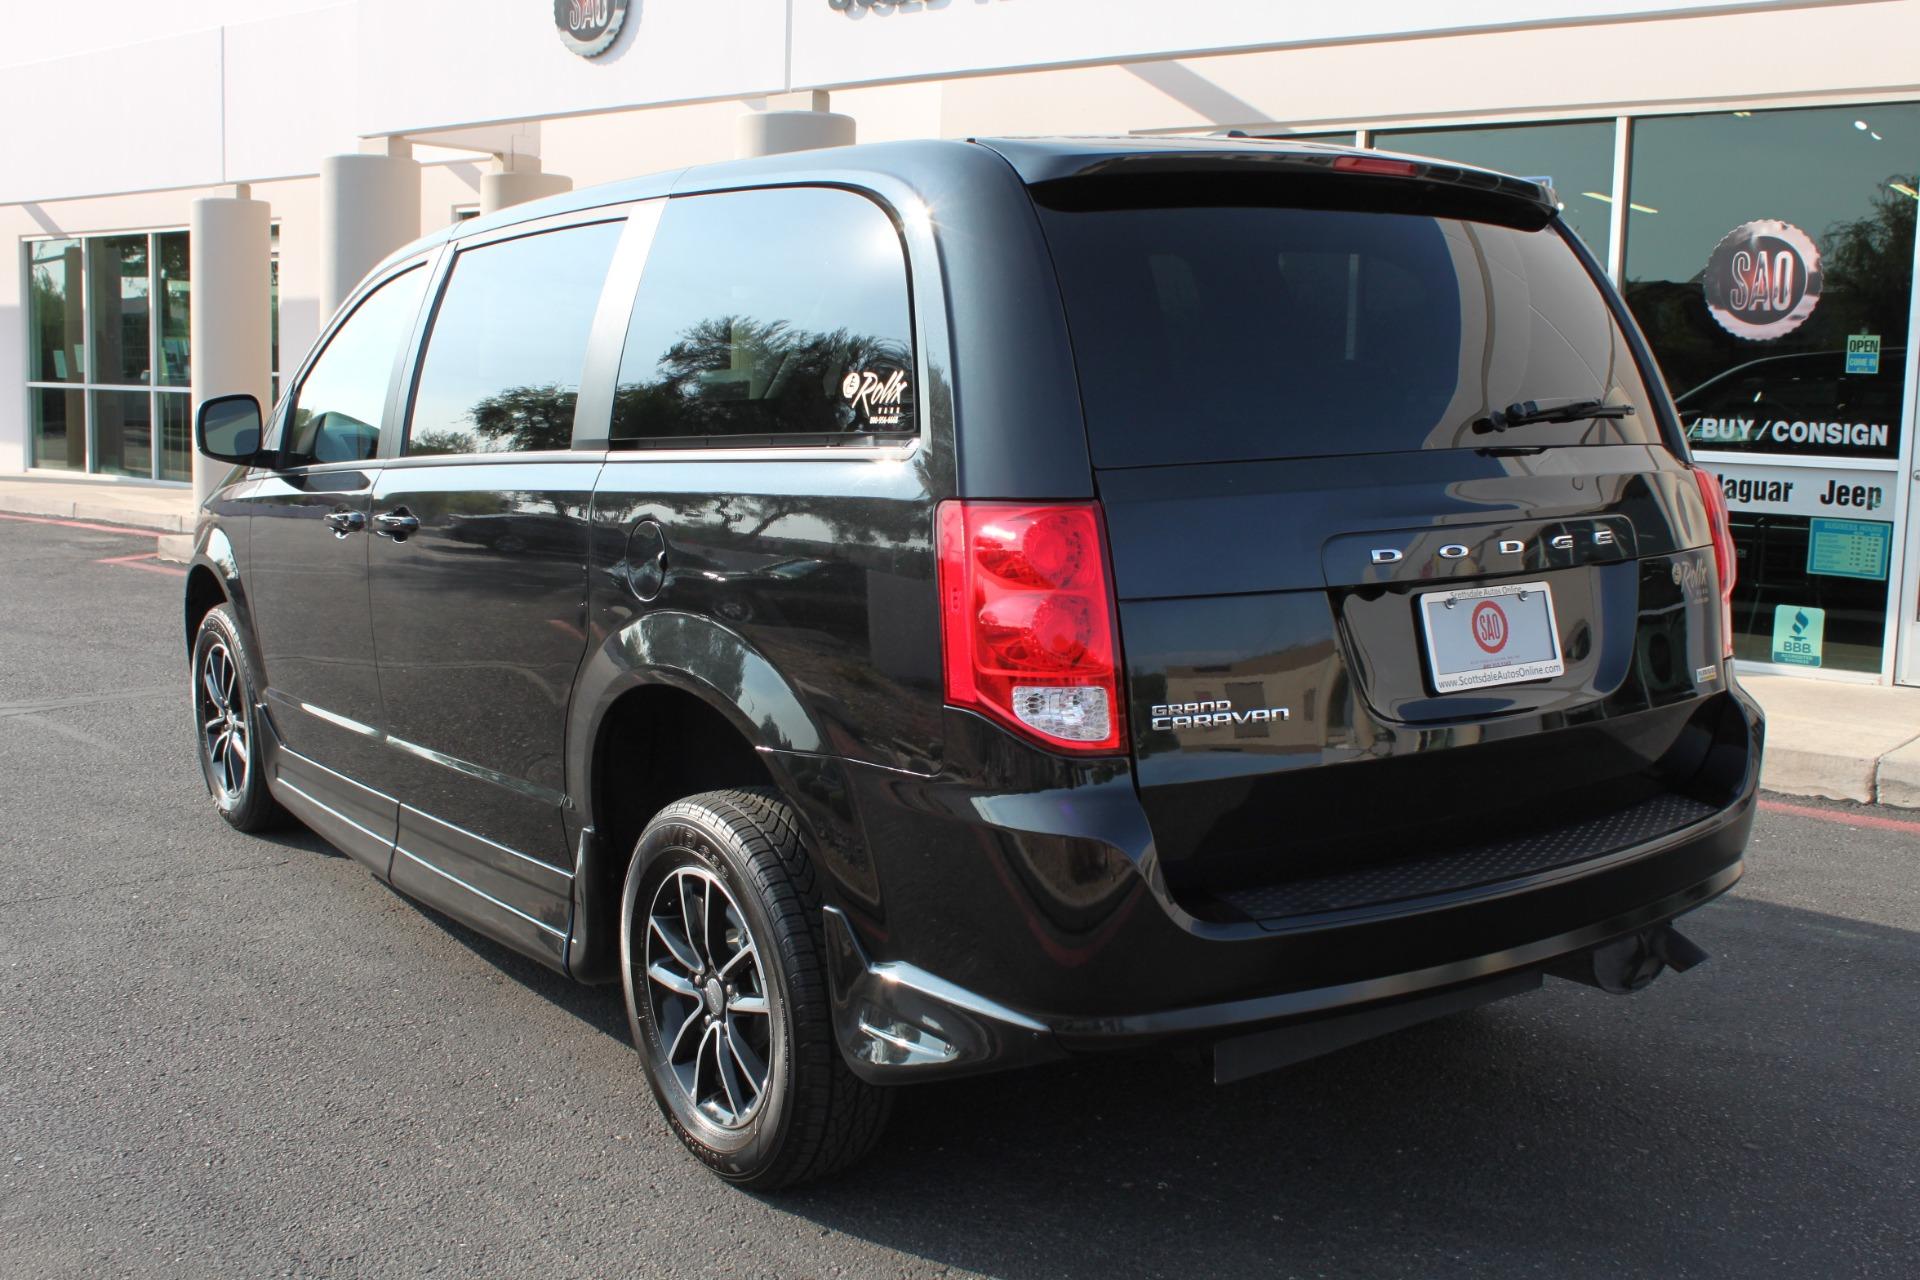 Used-2018-Dodge-Grand-Caravan-SXT-Rollx-Mobility-Conversion-Grand-Wagoneer